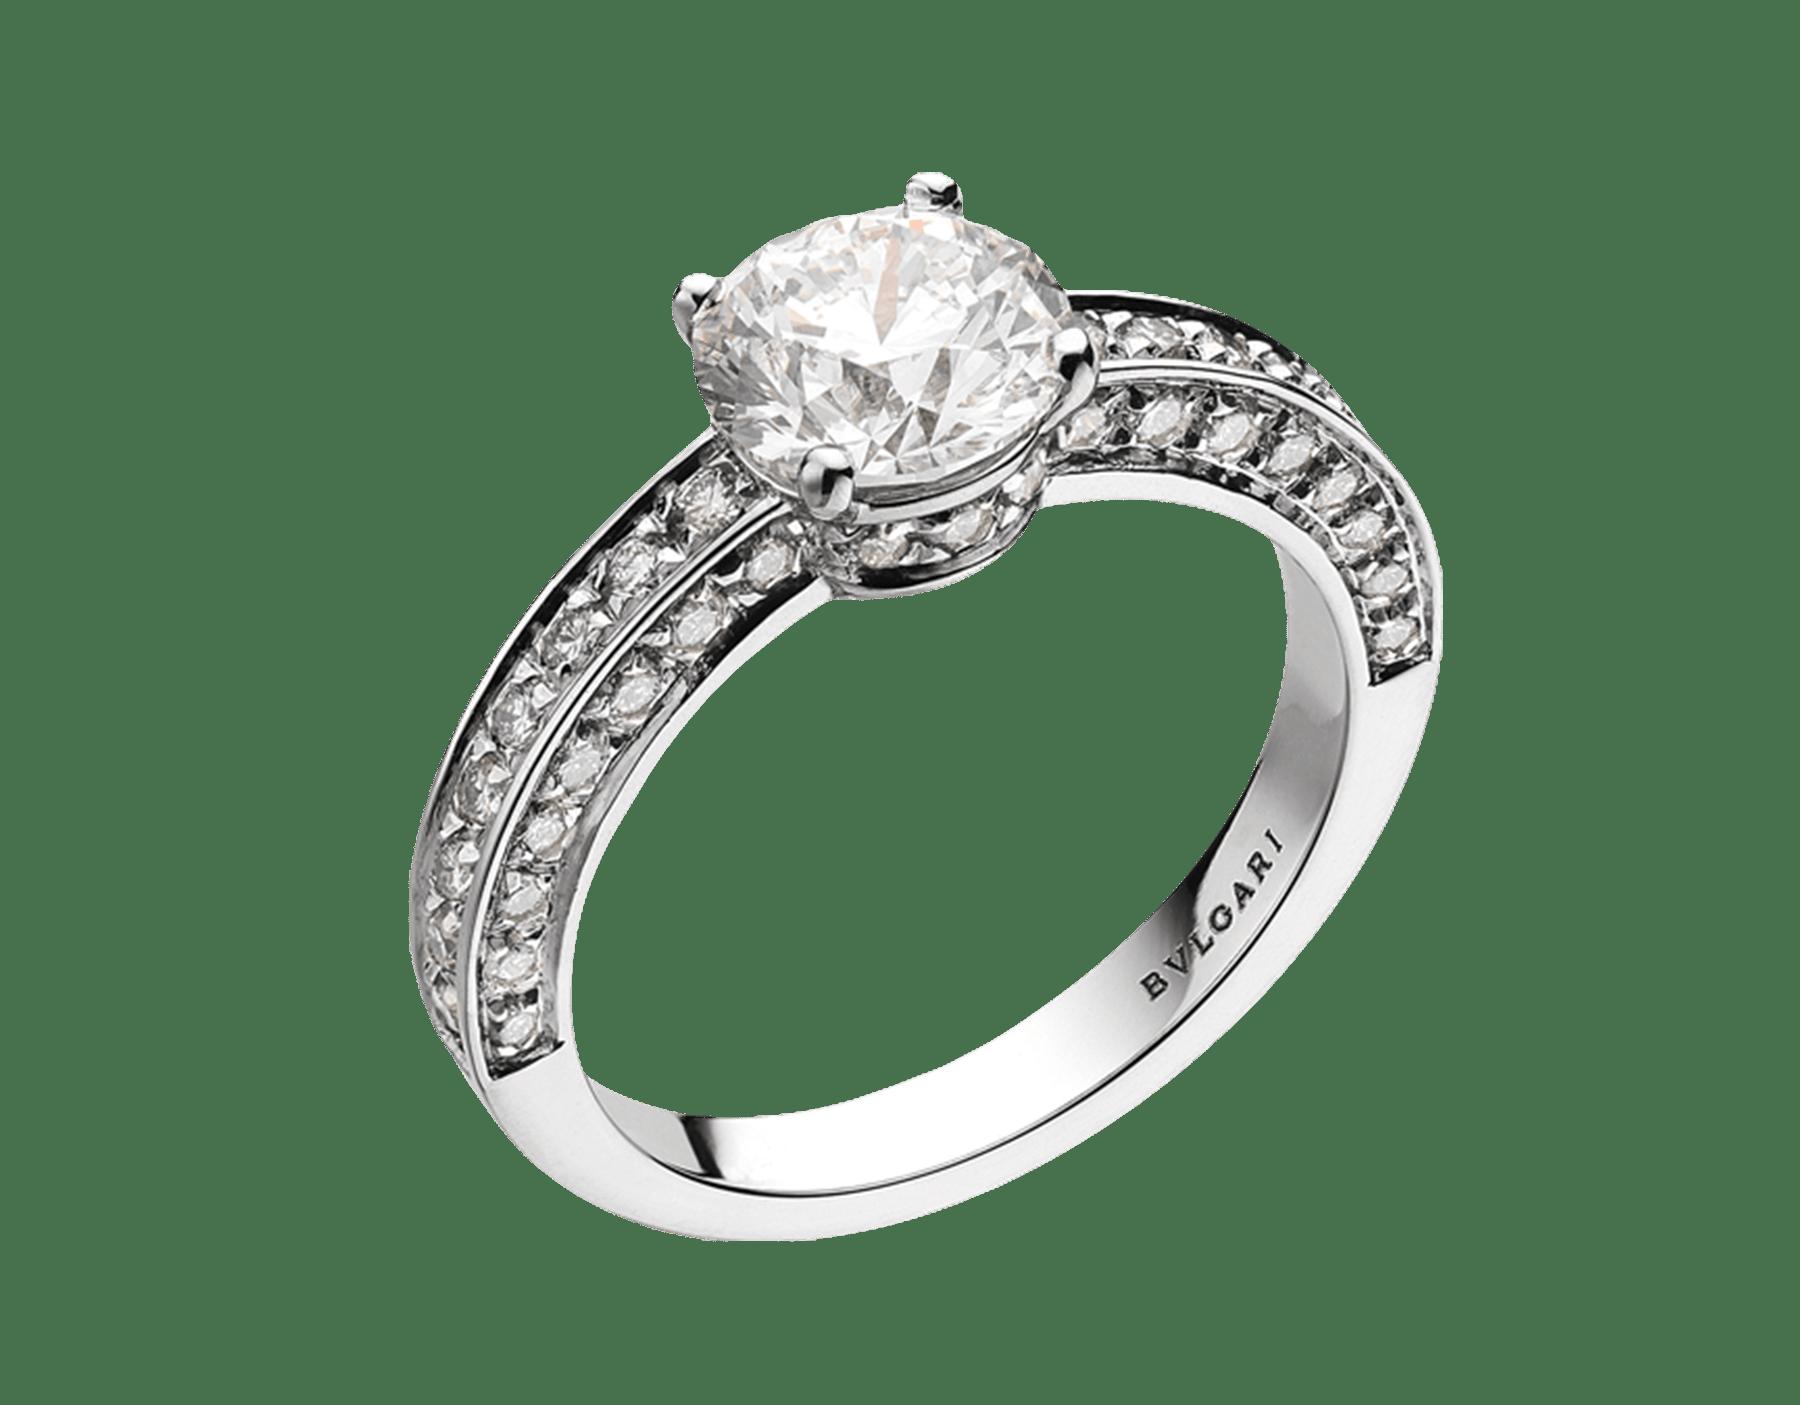 Dedicata a Venezia: 1503 鉑金單顆美鑽戒指,鑲飾圓形明亮型切割鑽石和密鑲鑽石。鑽石重量 0.30 克拉起。定情戒在歷史上最早見於西元 1503 年,這款戒指就是以此命名。 344083 image 1